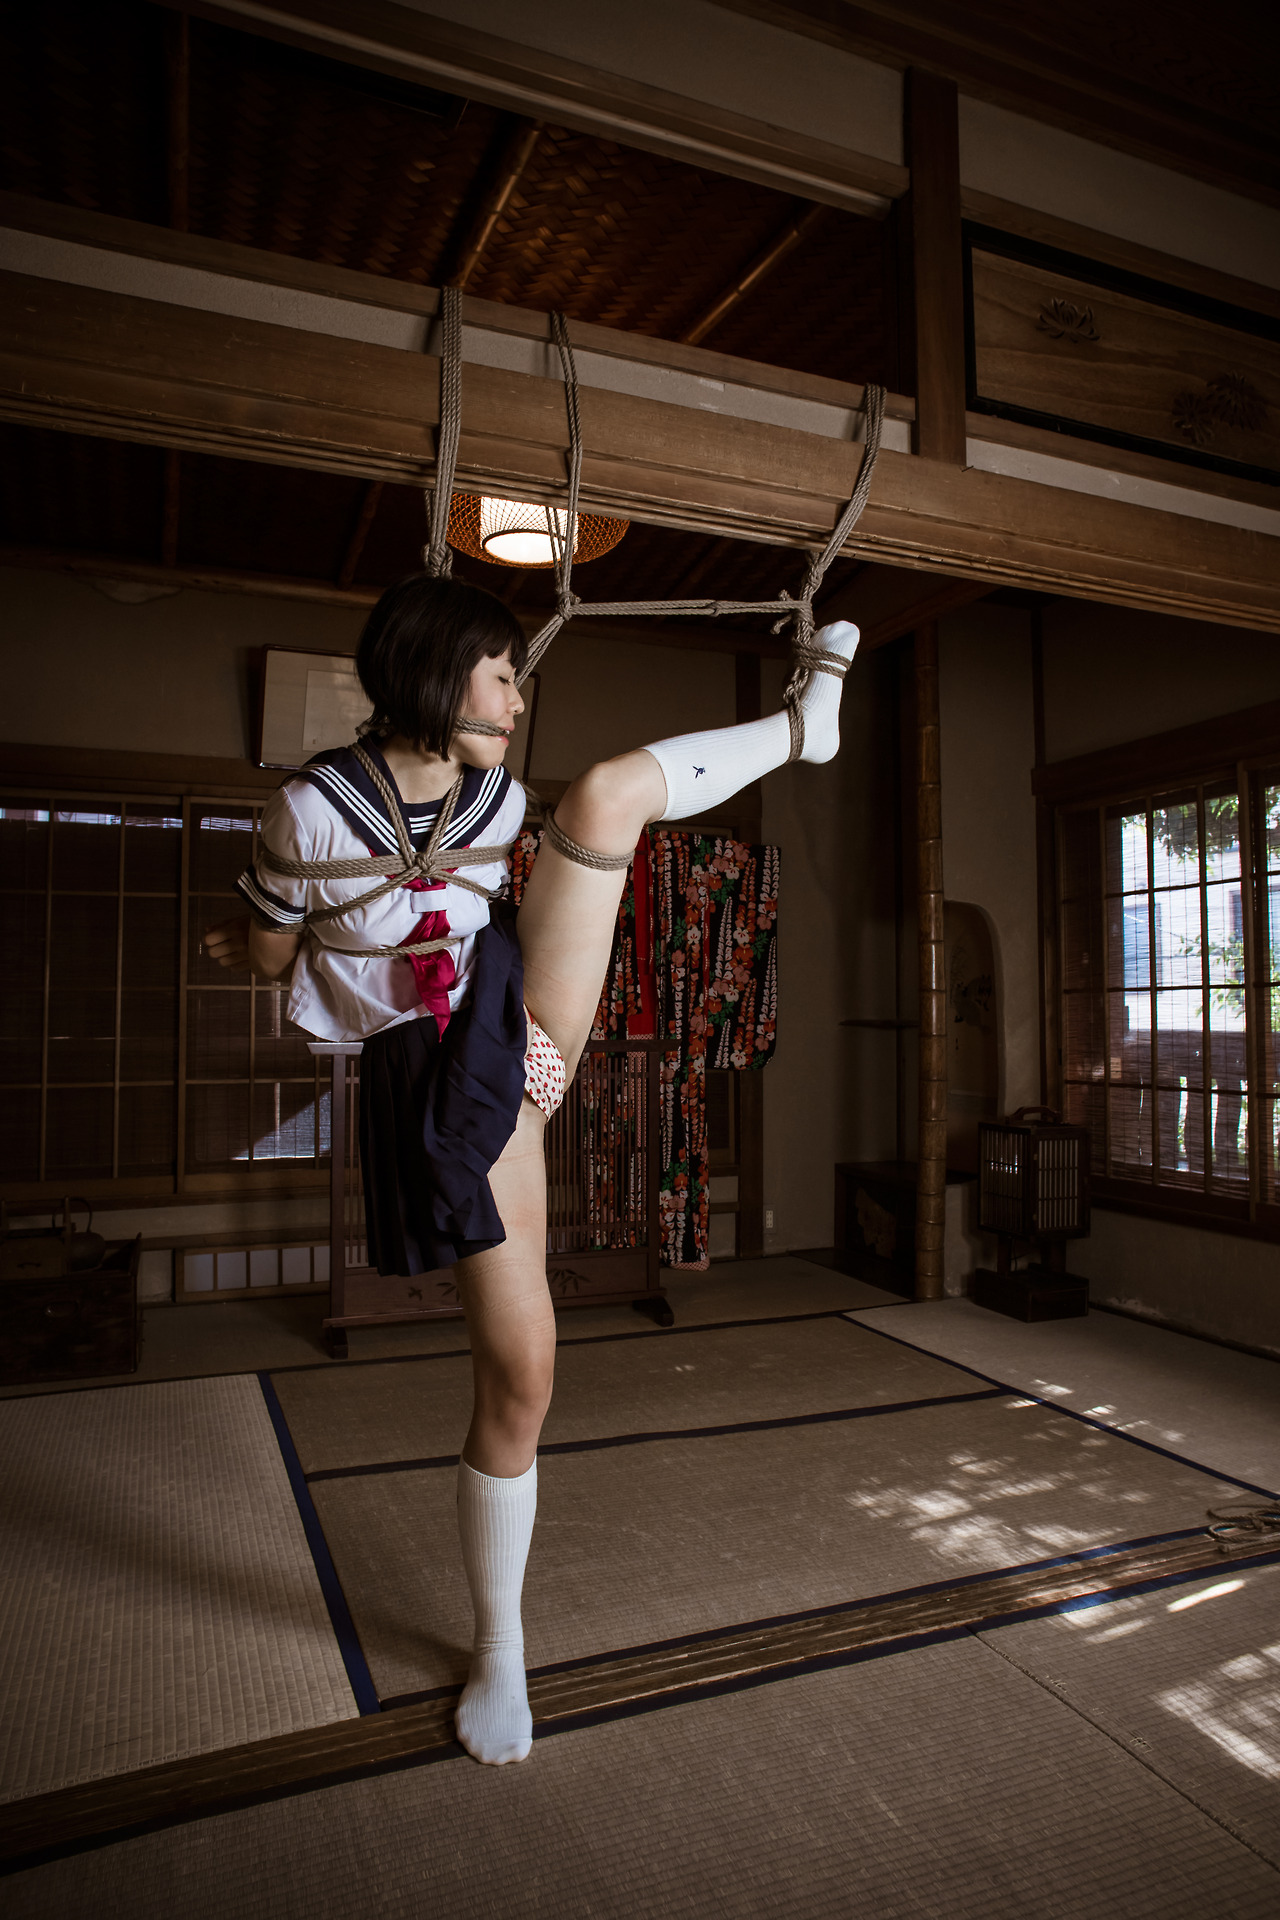 miad747 走り高跳び県大会記録保持者の長身アスリートSEX!! 平沢なつ